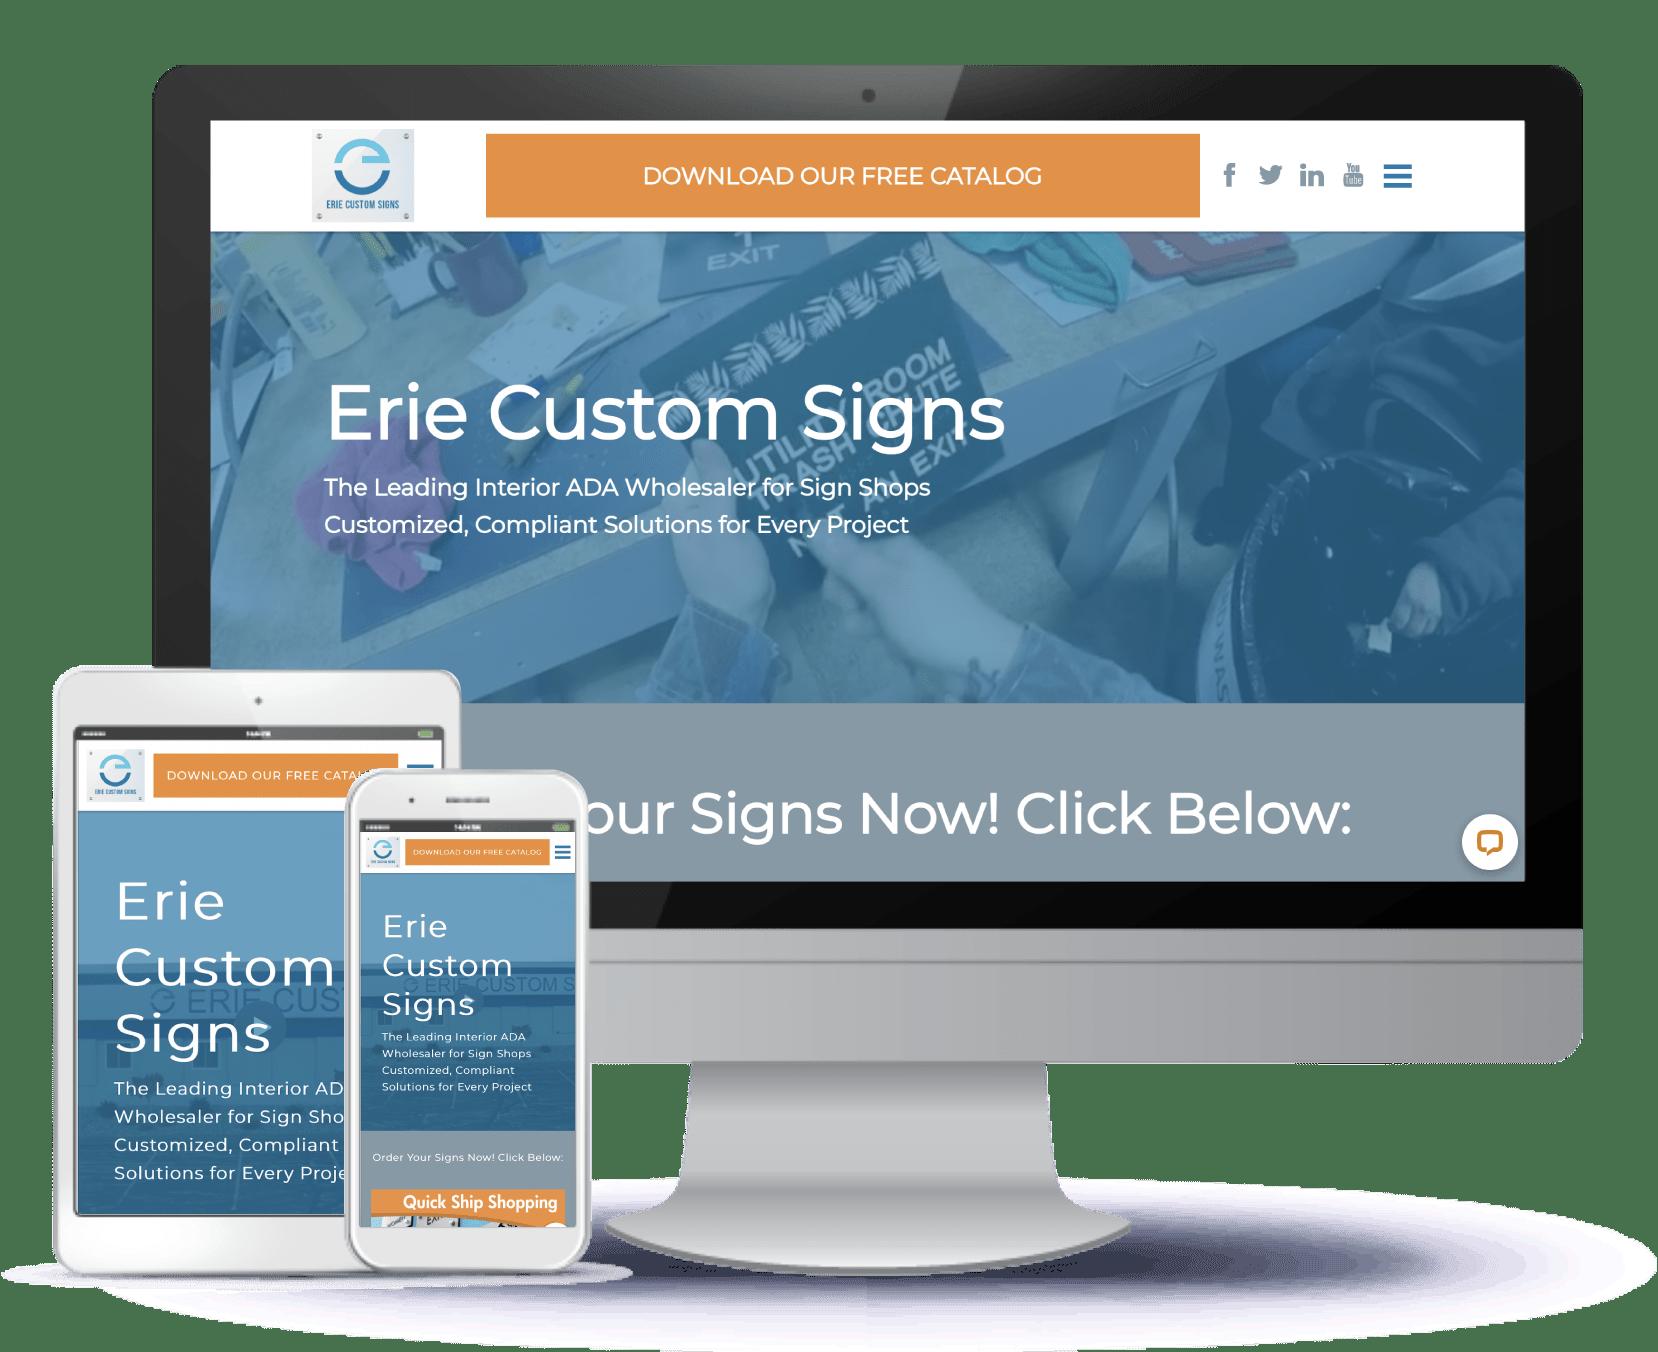 Erie Custom Signs